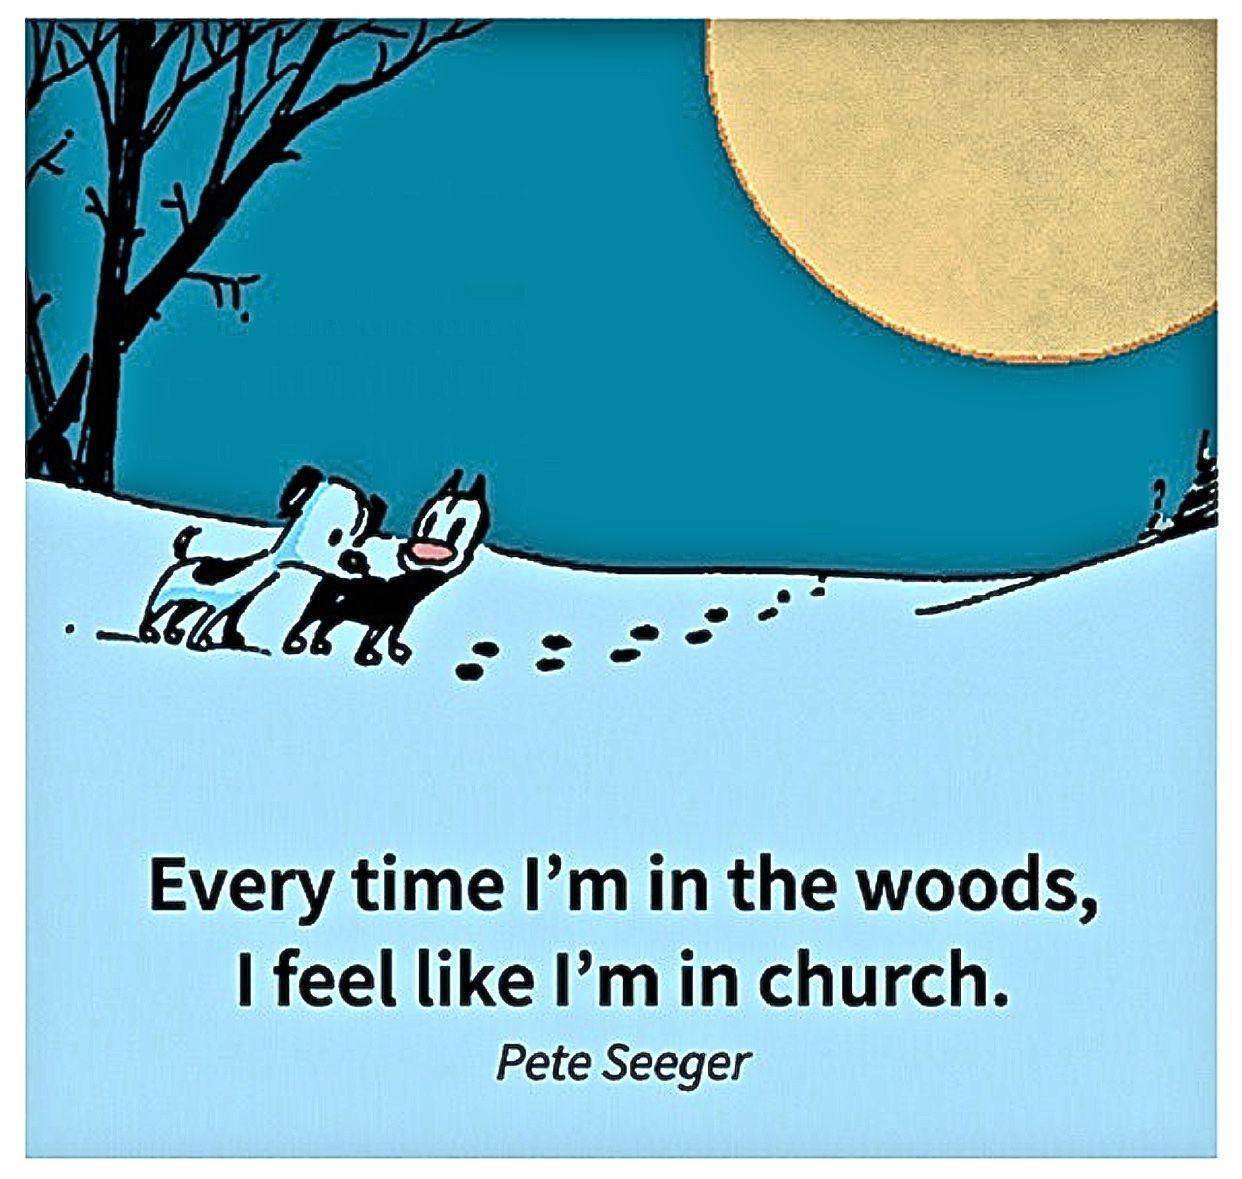 Every Time I'm In The Woods... I Feel Like I'm In Church ~ Pete Seeger .... Mutts